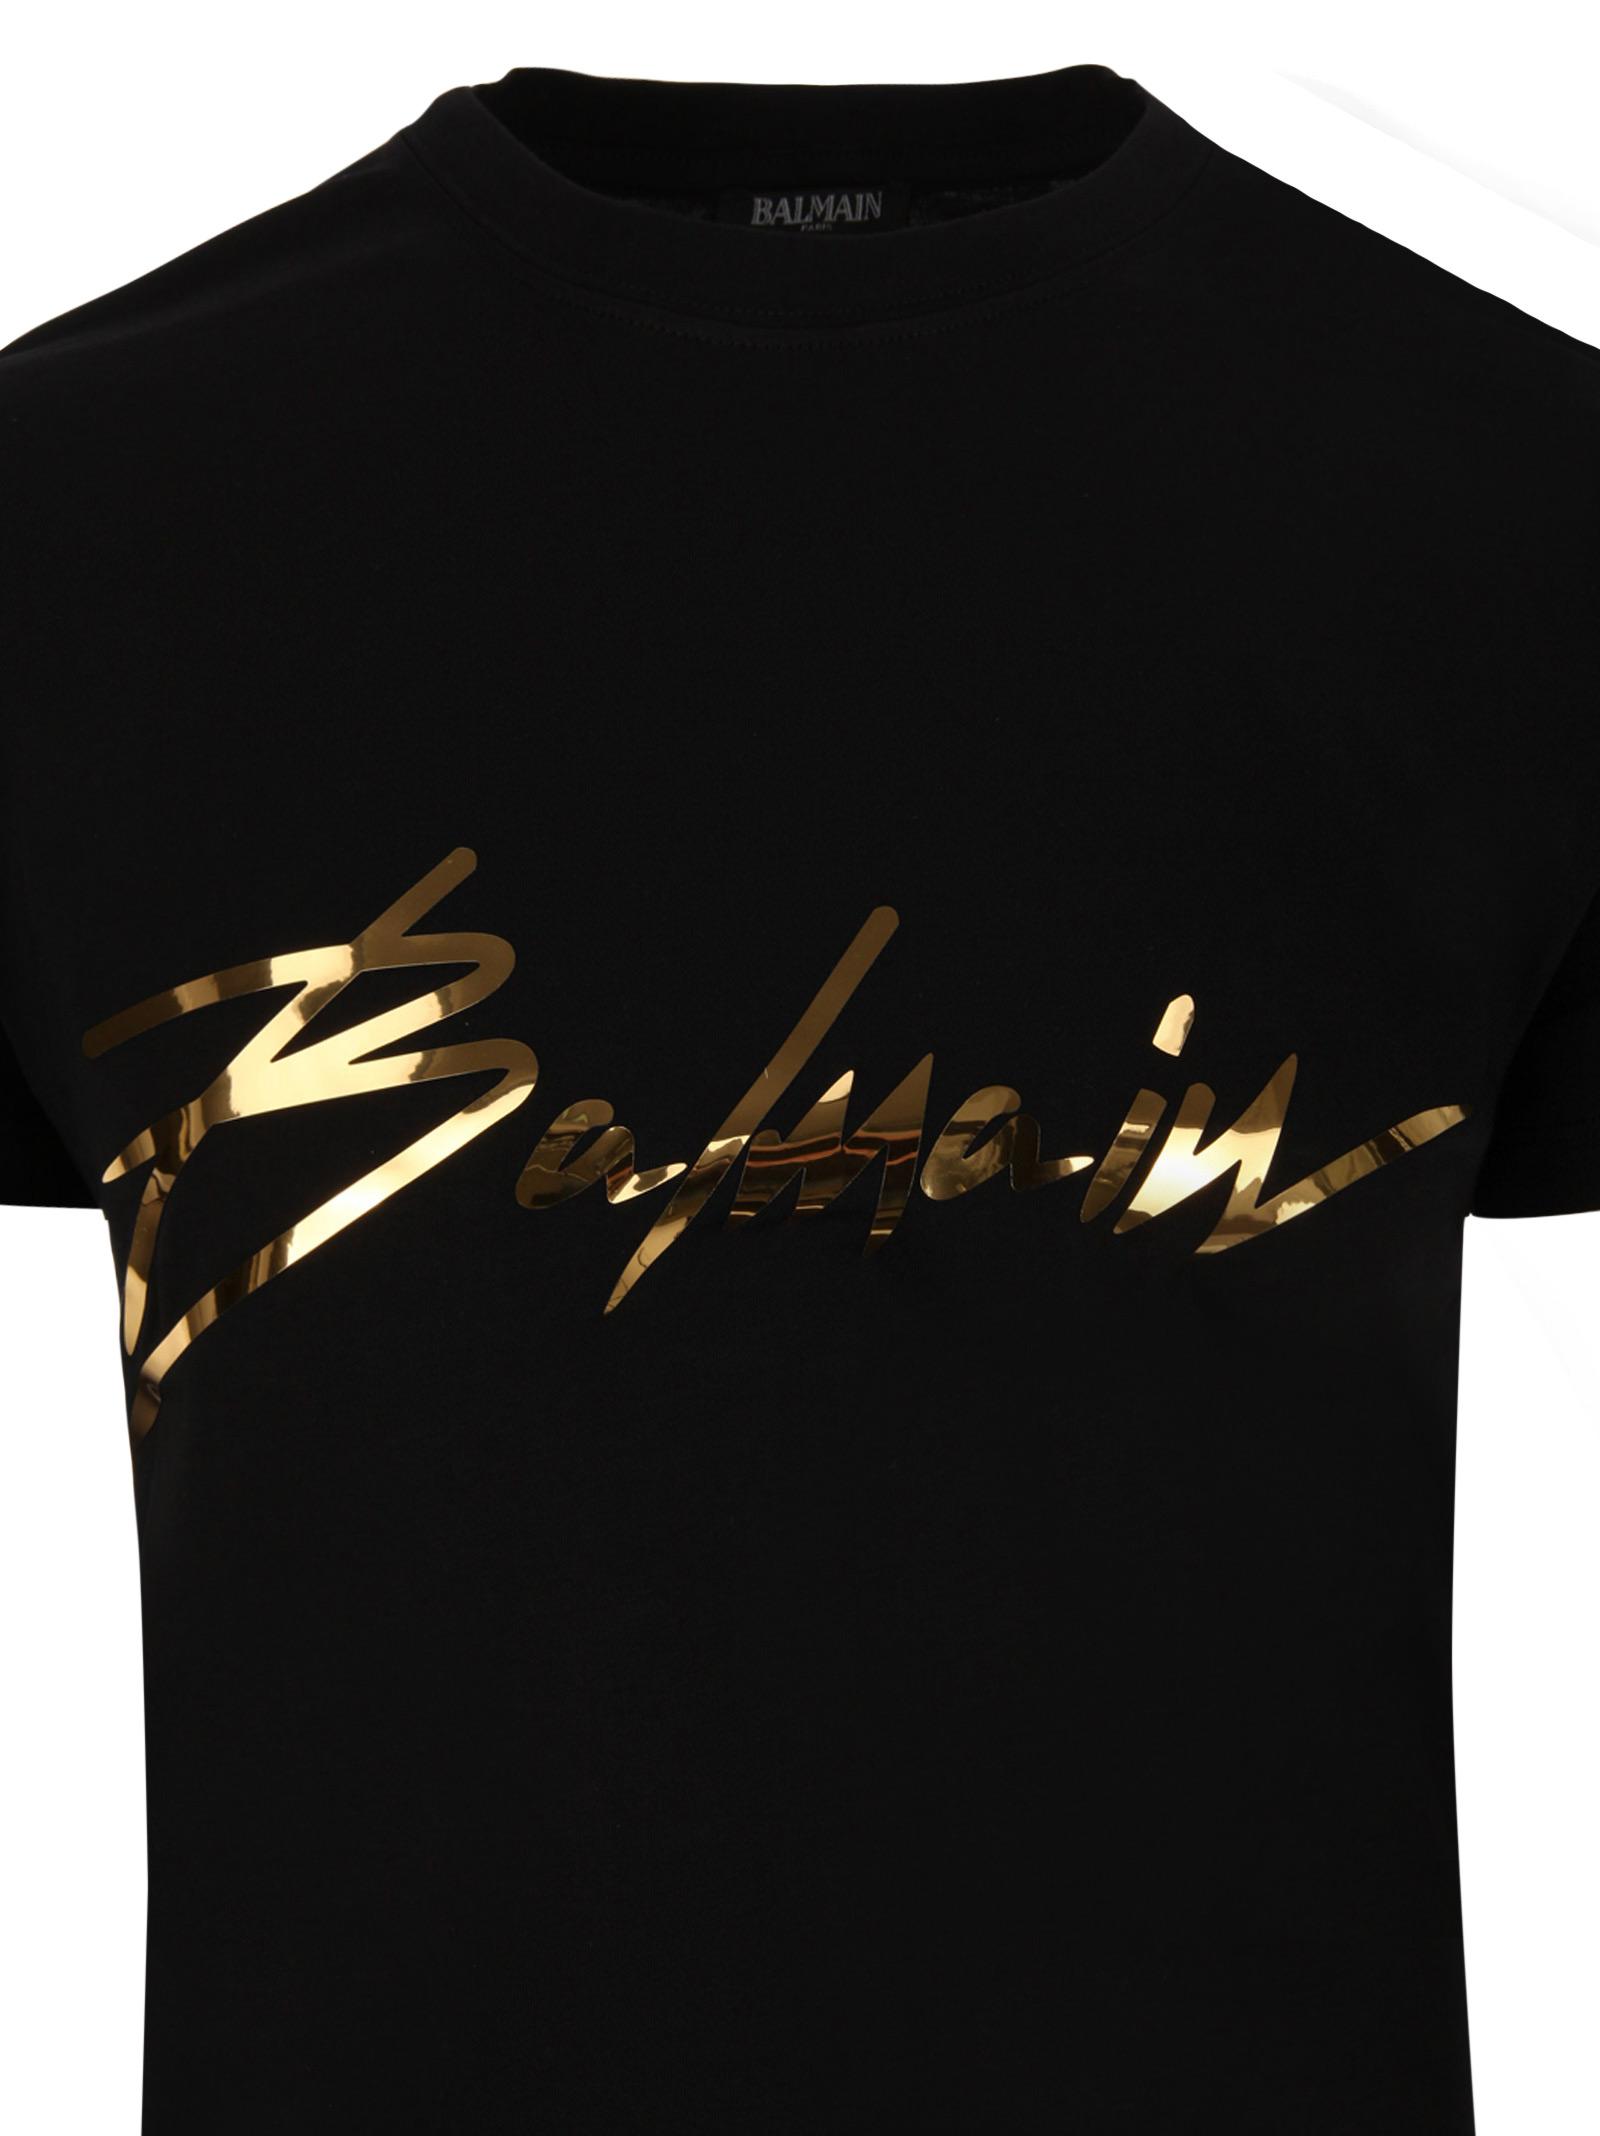 67f93cb5ce60f Balmain Paris t-shirt - BALMAIN PARIS - Michele Franzese Moda